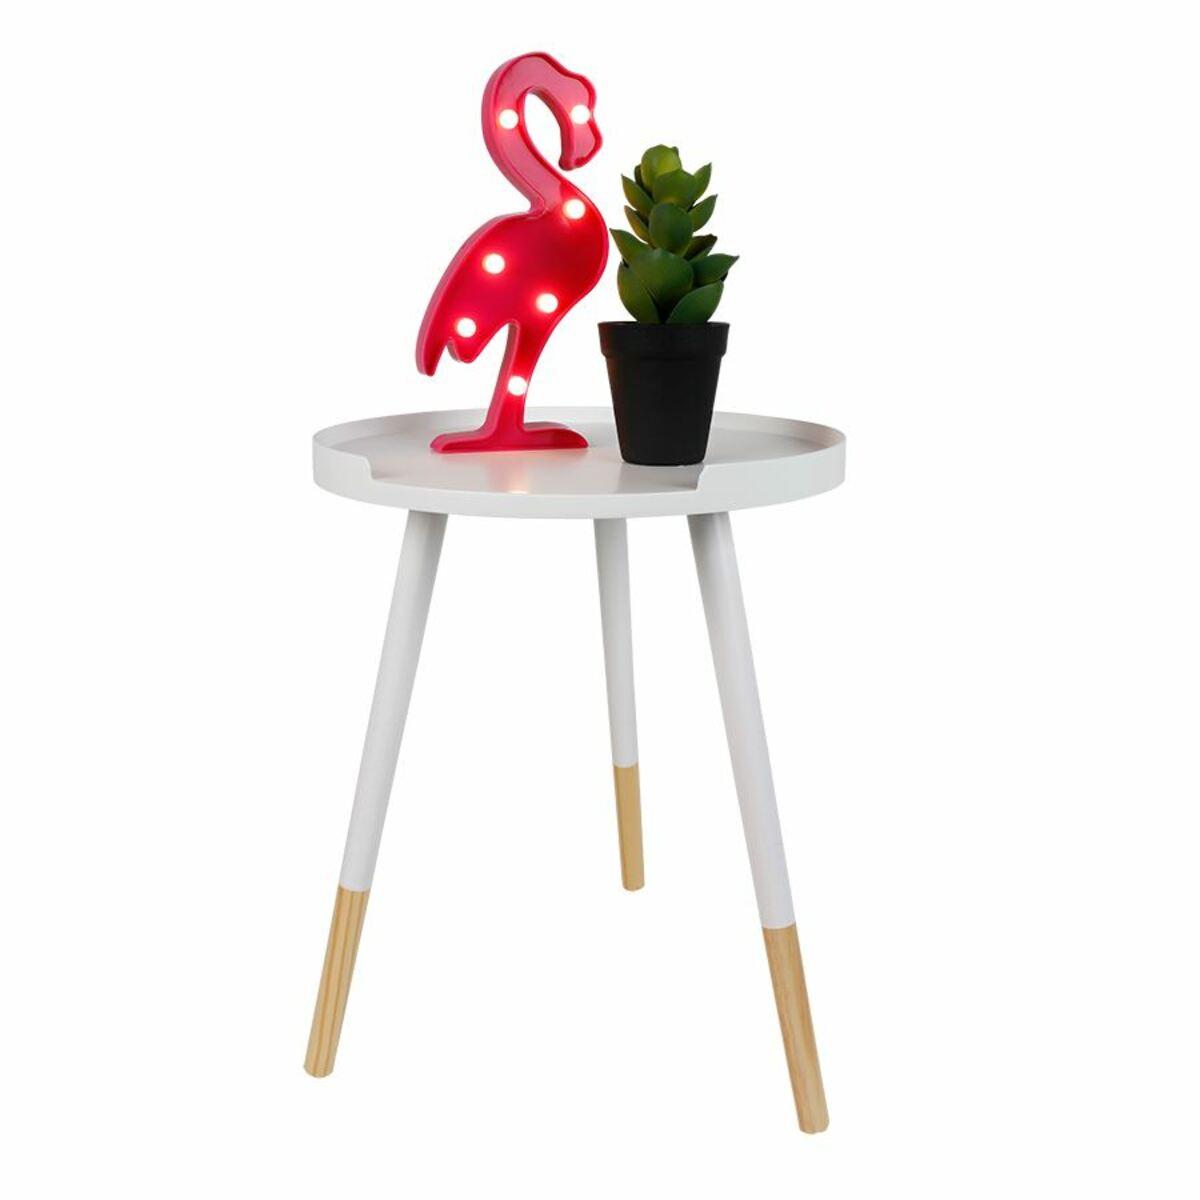 Bild 5 von LED-Dekofigur Flamingo 13x29,5x3cm Warmweiß